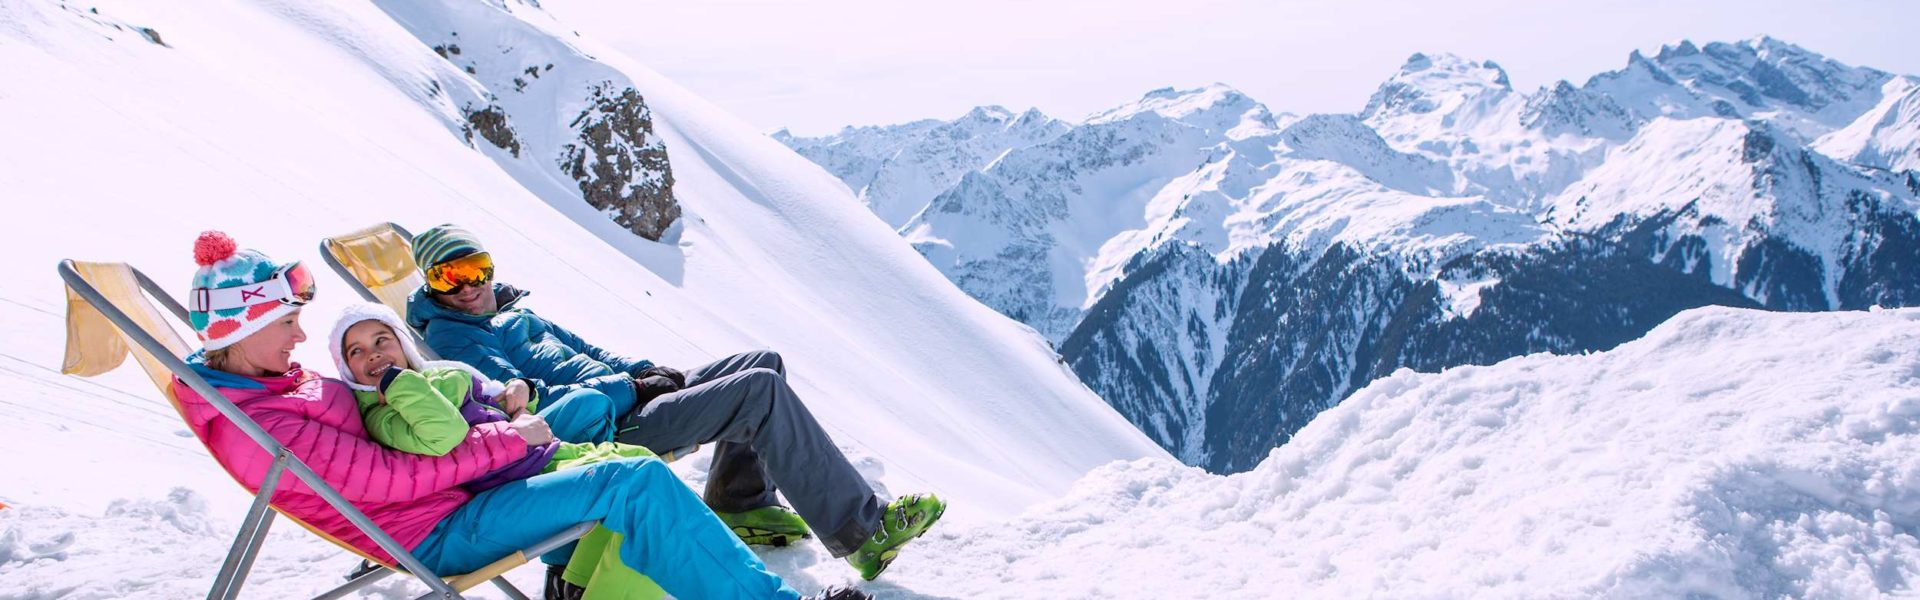 Sonnenski, Relaxen im Skigebiet Montafon (c) Daniel Zangerl / Montafon Tourismus GmbH